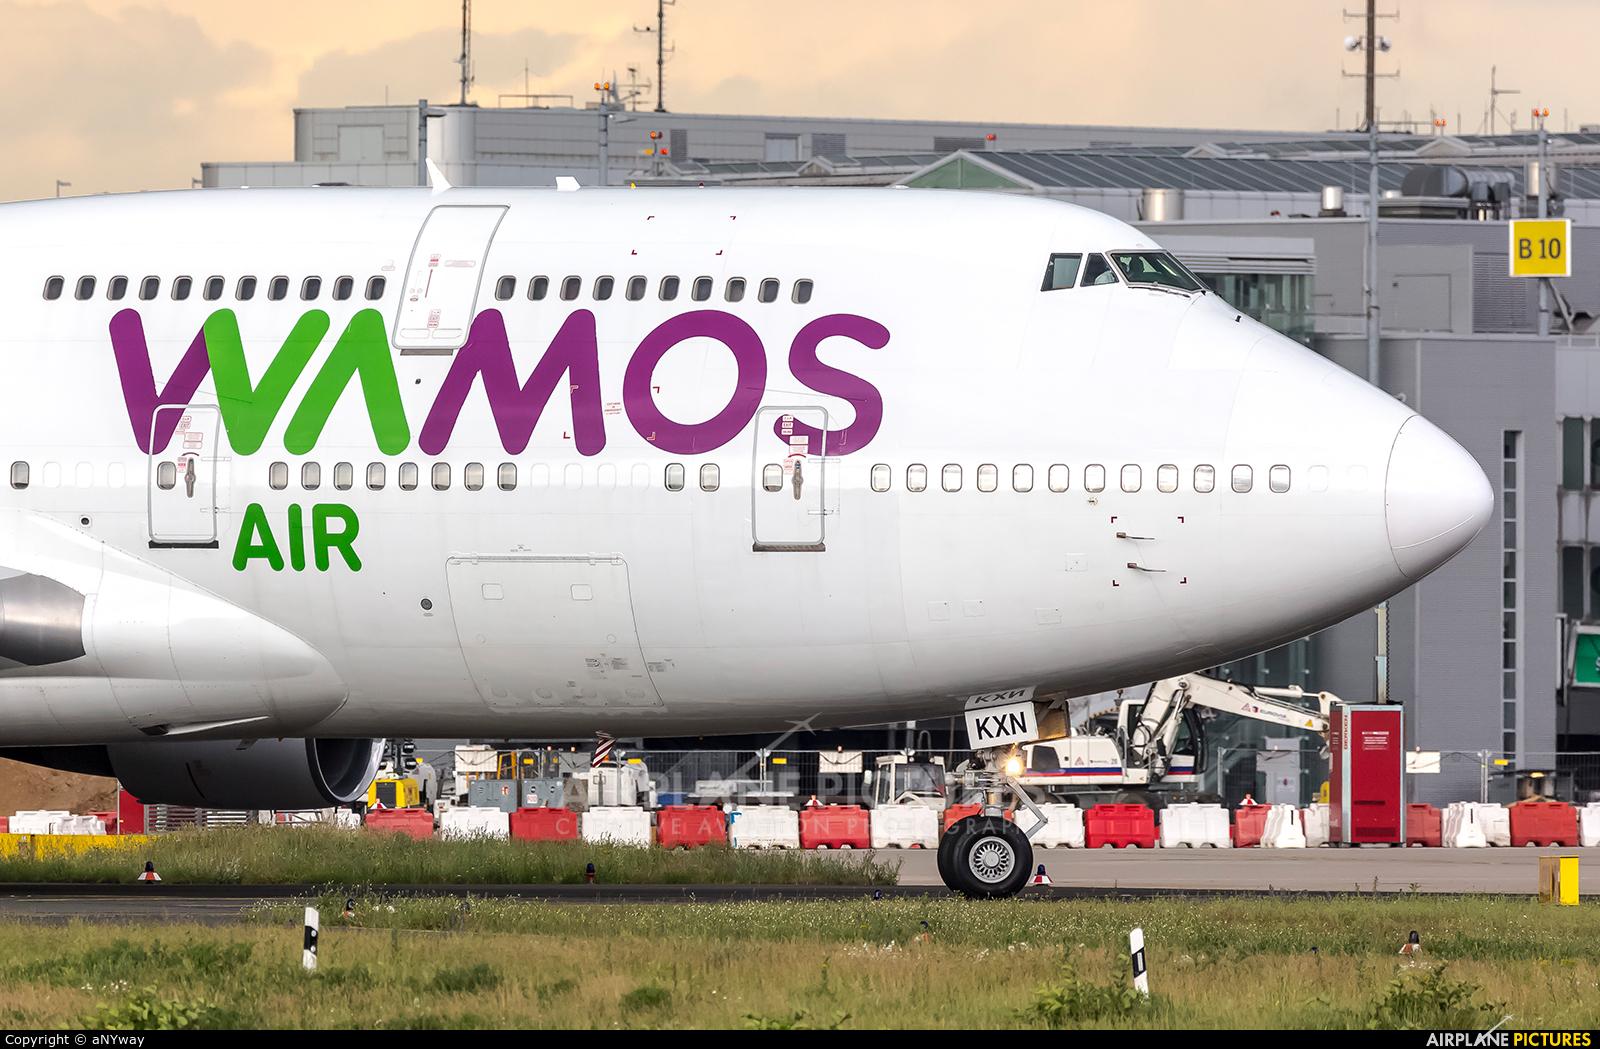 Wamos Air EC-KXN aircraft at Düsseldorf